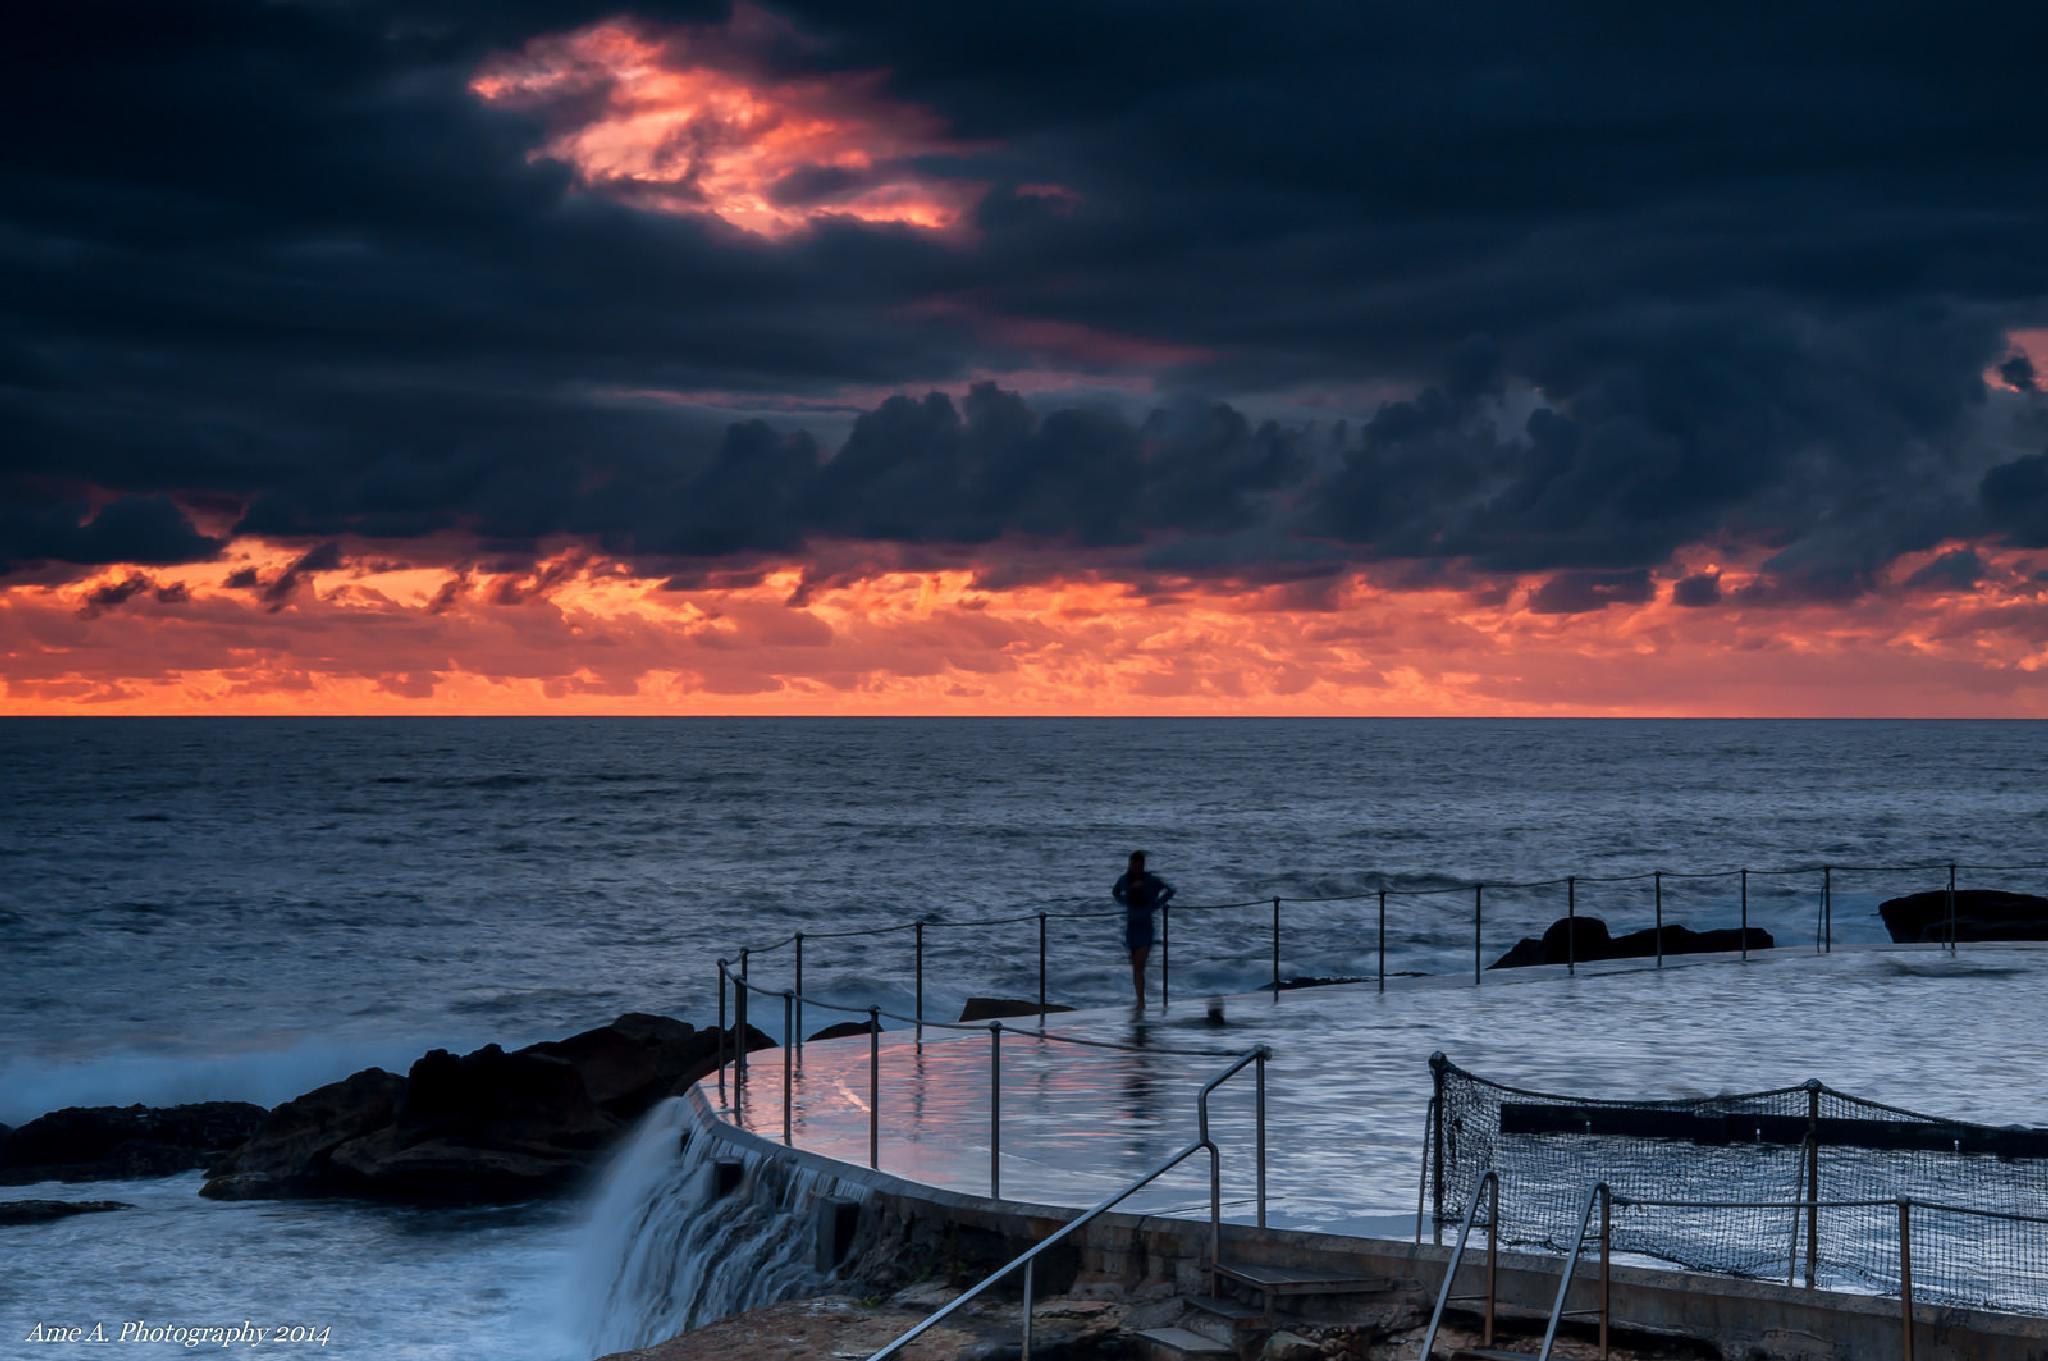 Sunrise: Bronte Baths by Argie Alvarez-Calibo